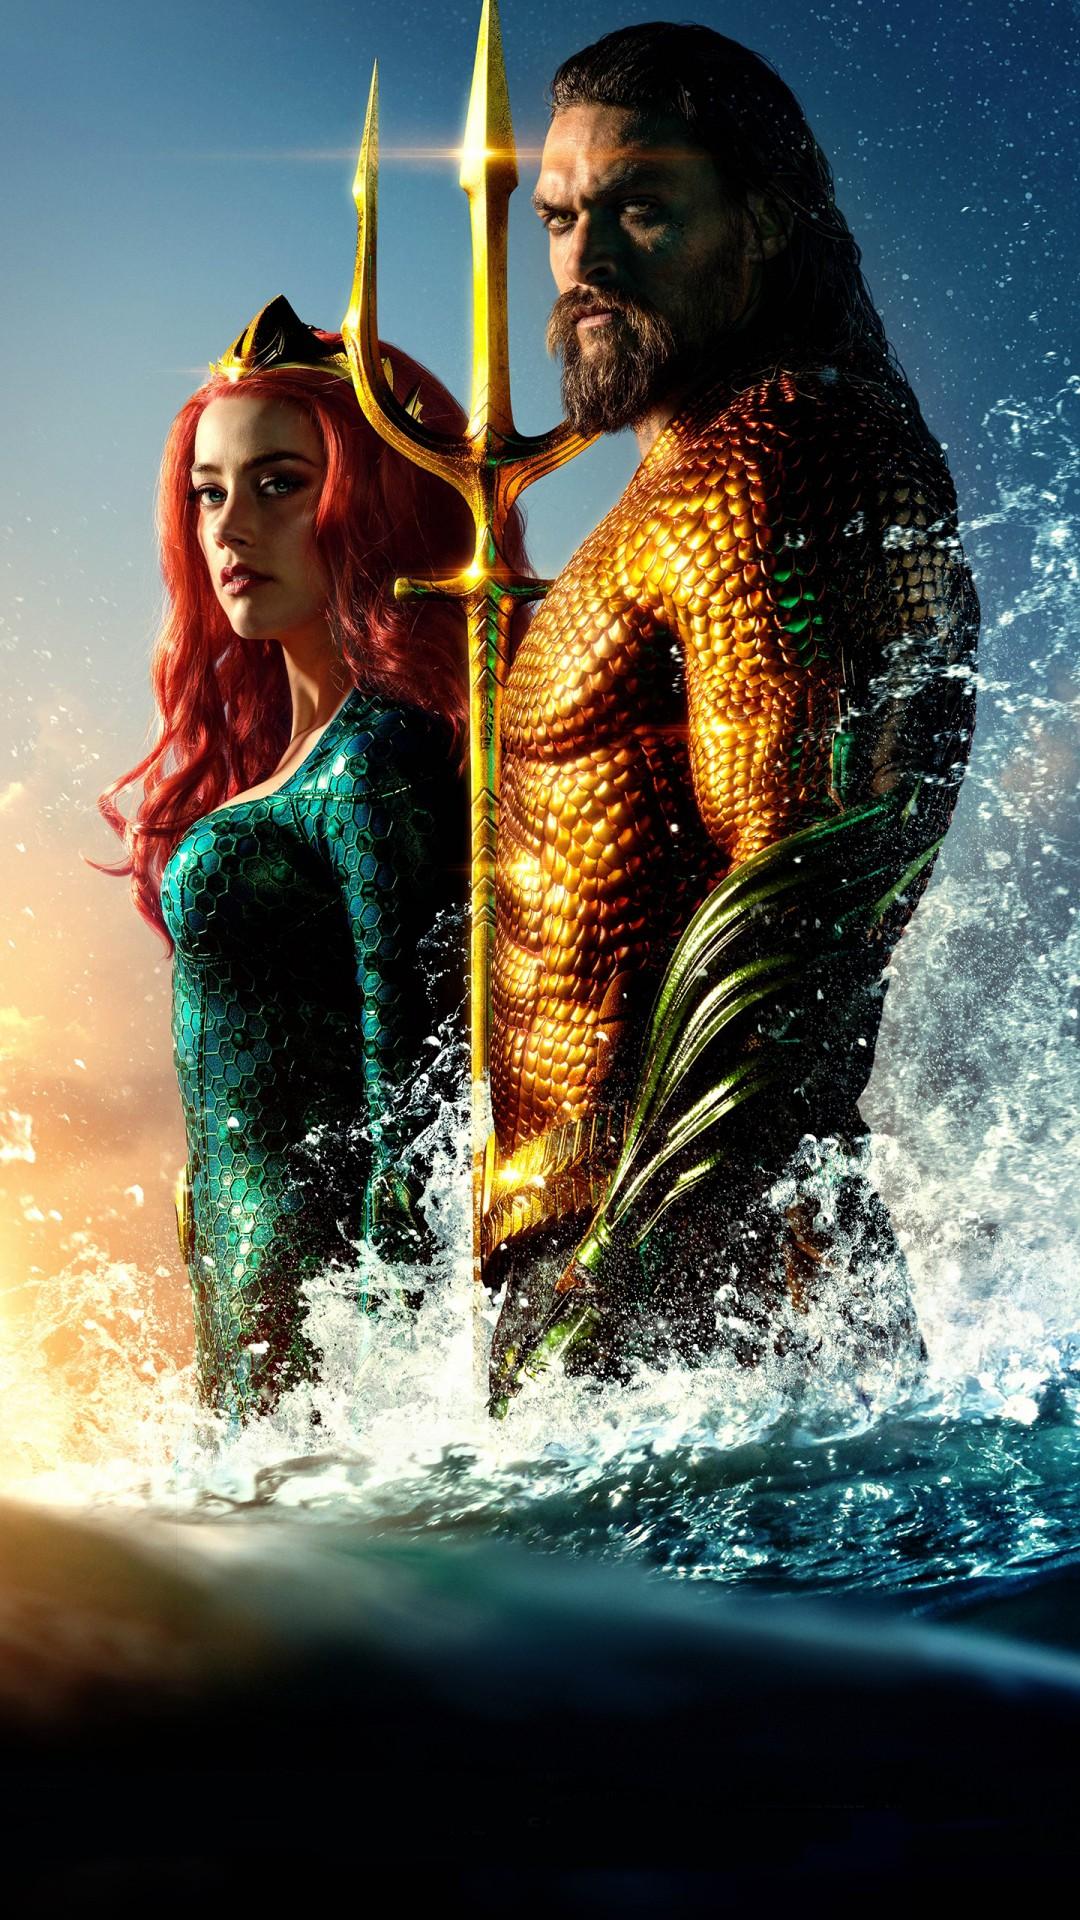 Gold Wallpaper Iphone X Mera Amp Aquaman In Aquaman 5k Wallpapers Hd Wallpapers